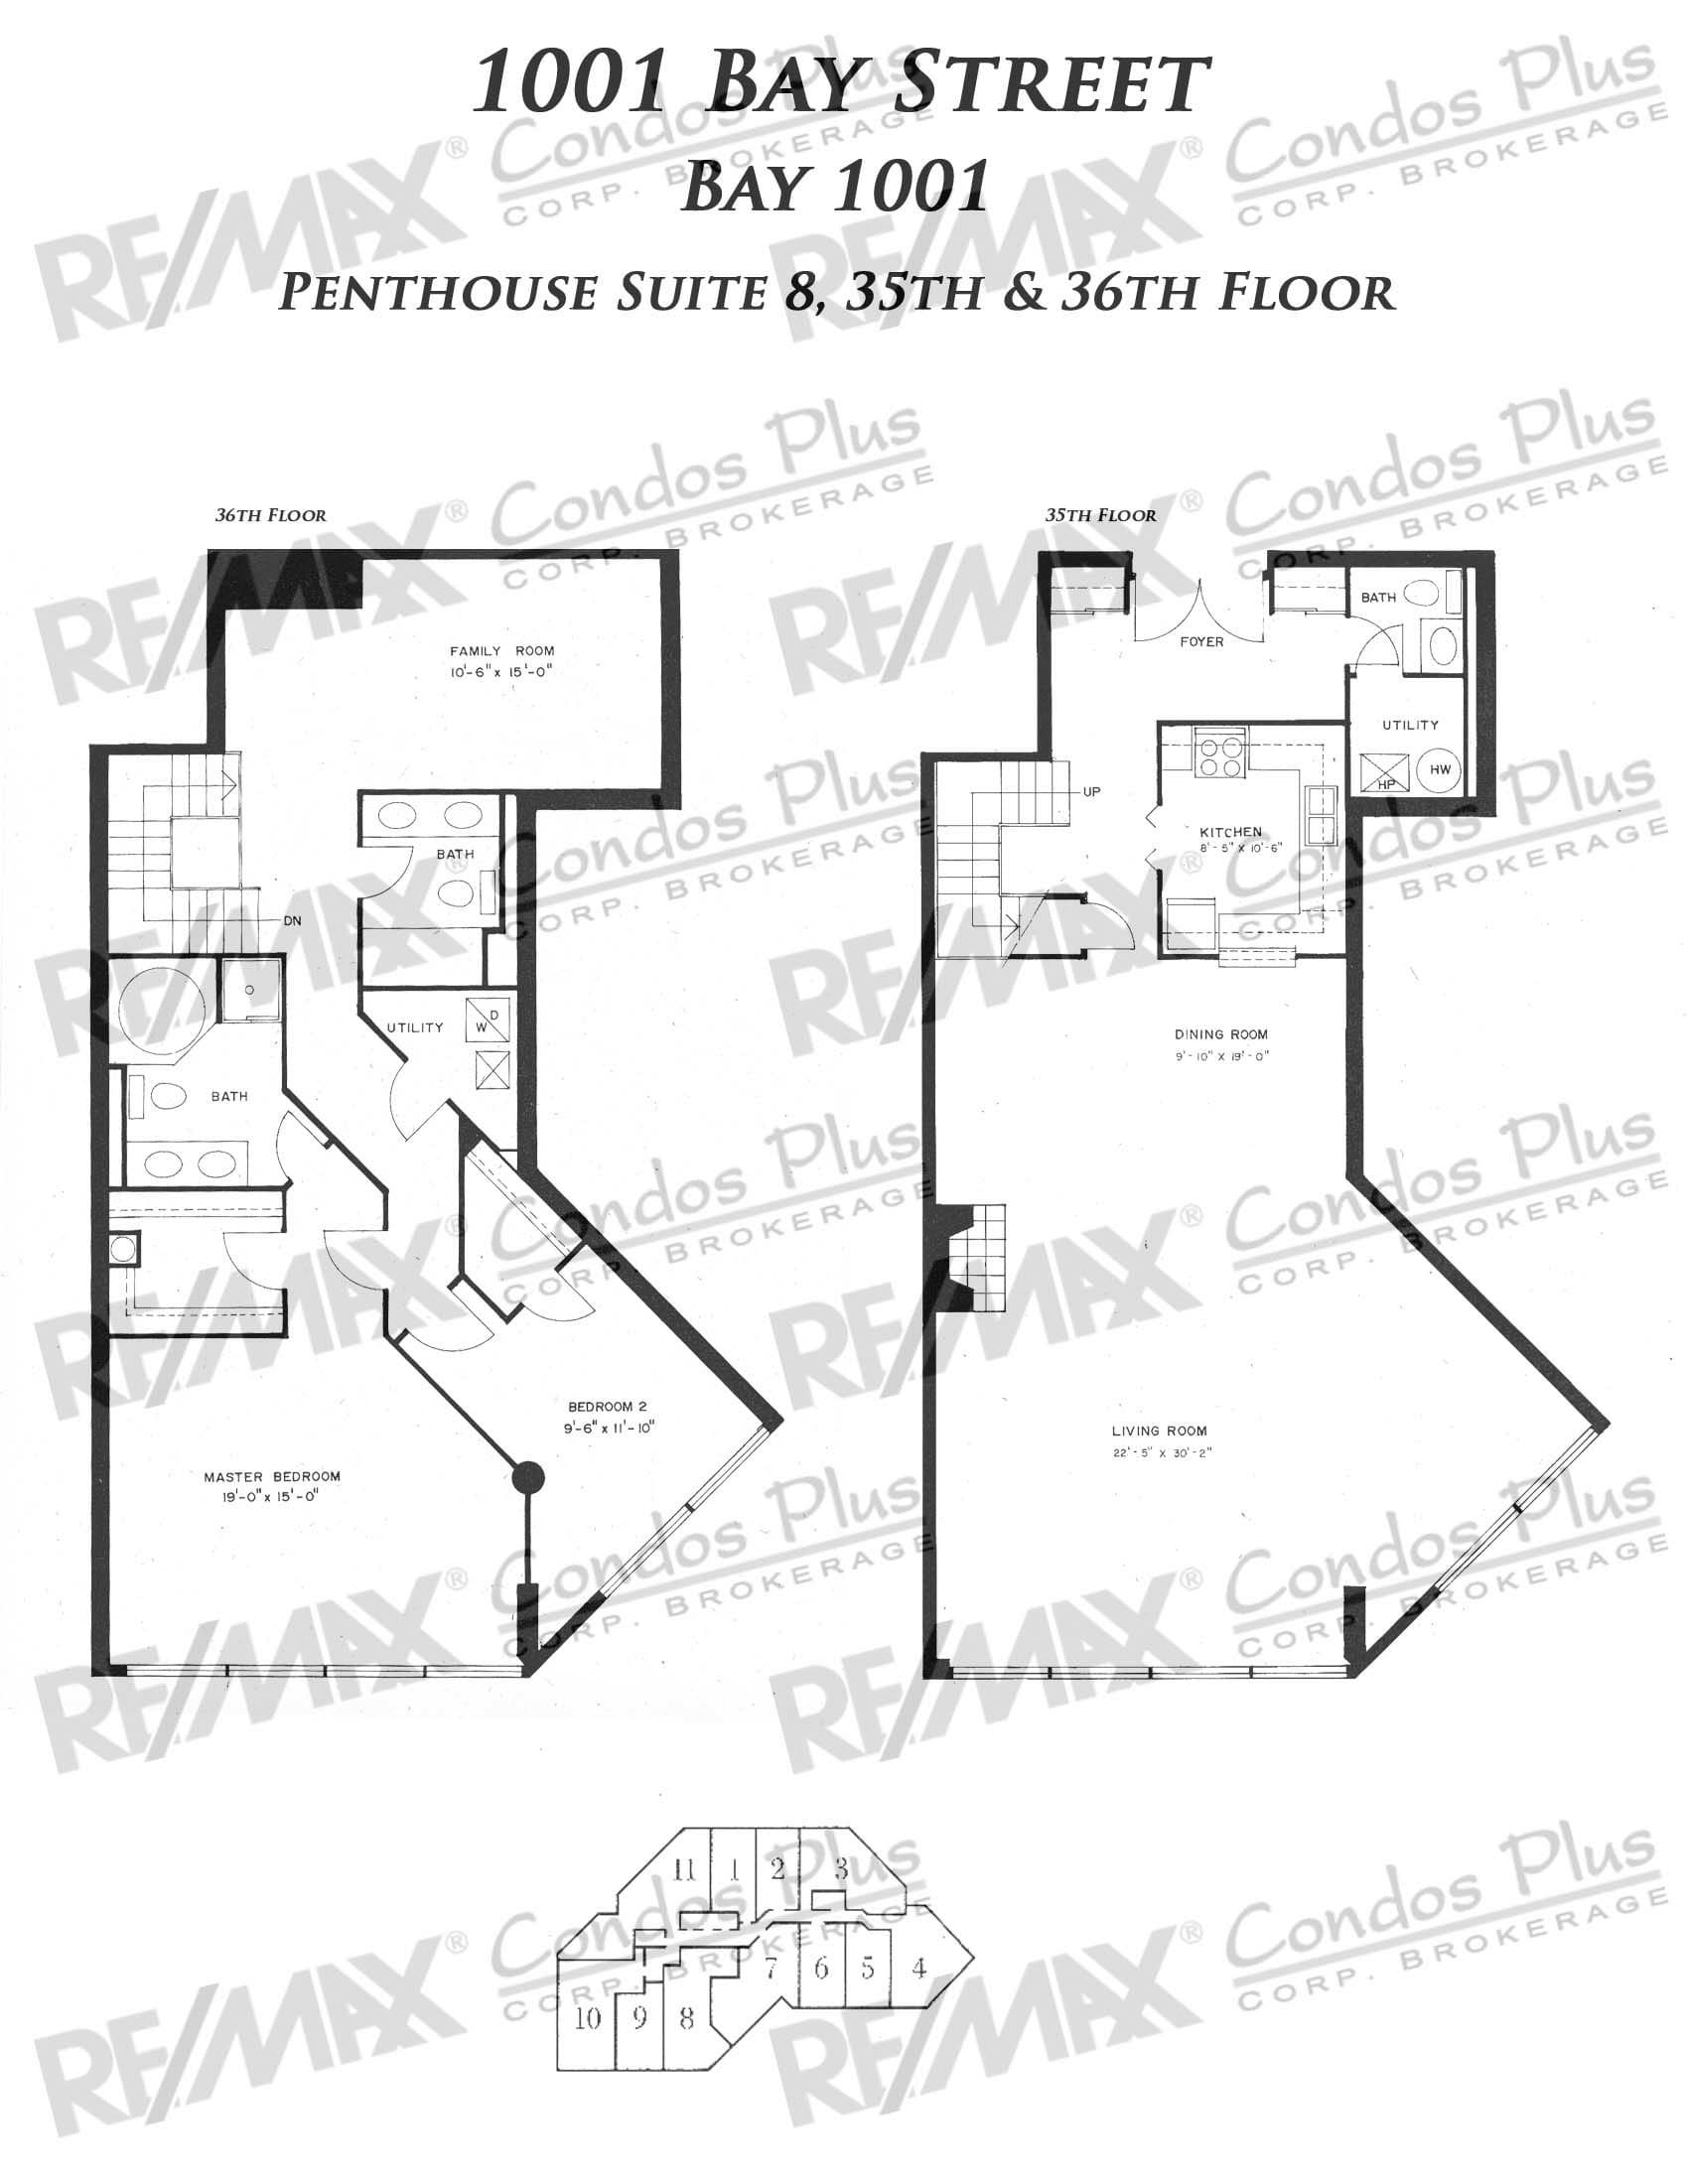 PenthouseSuite08-35th36thFloor